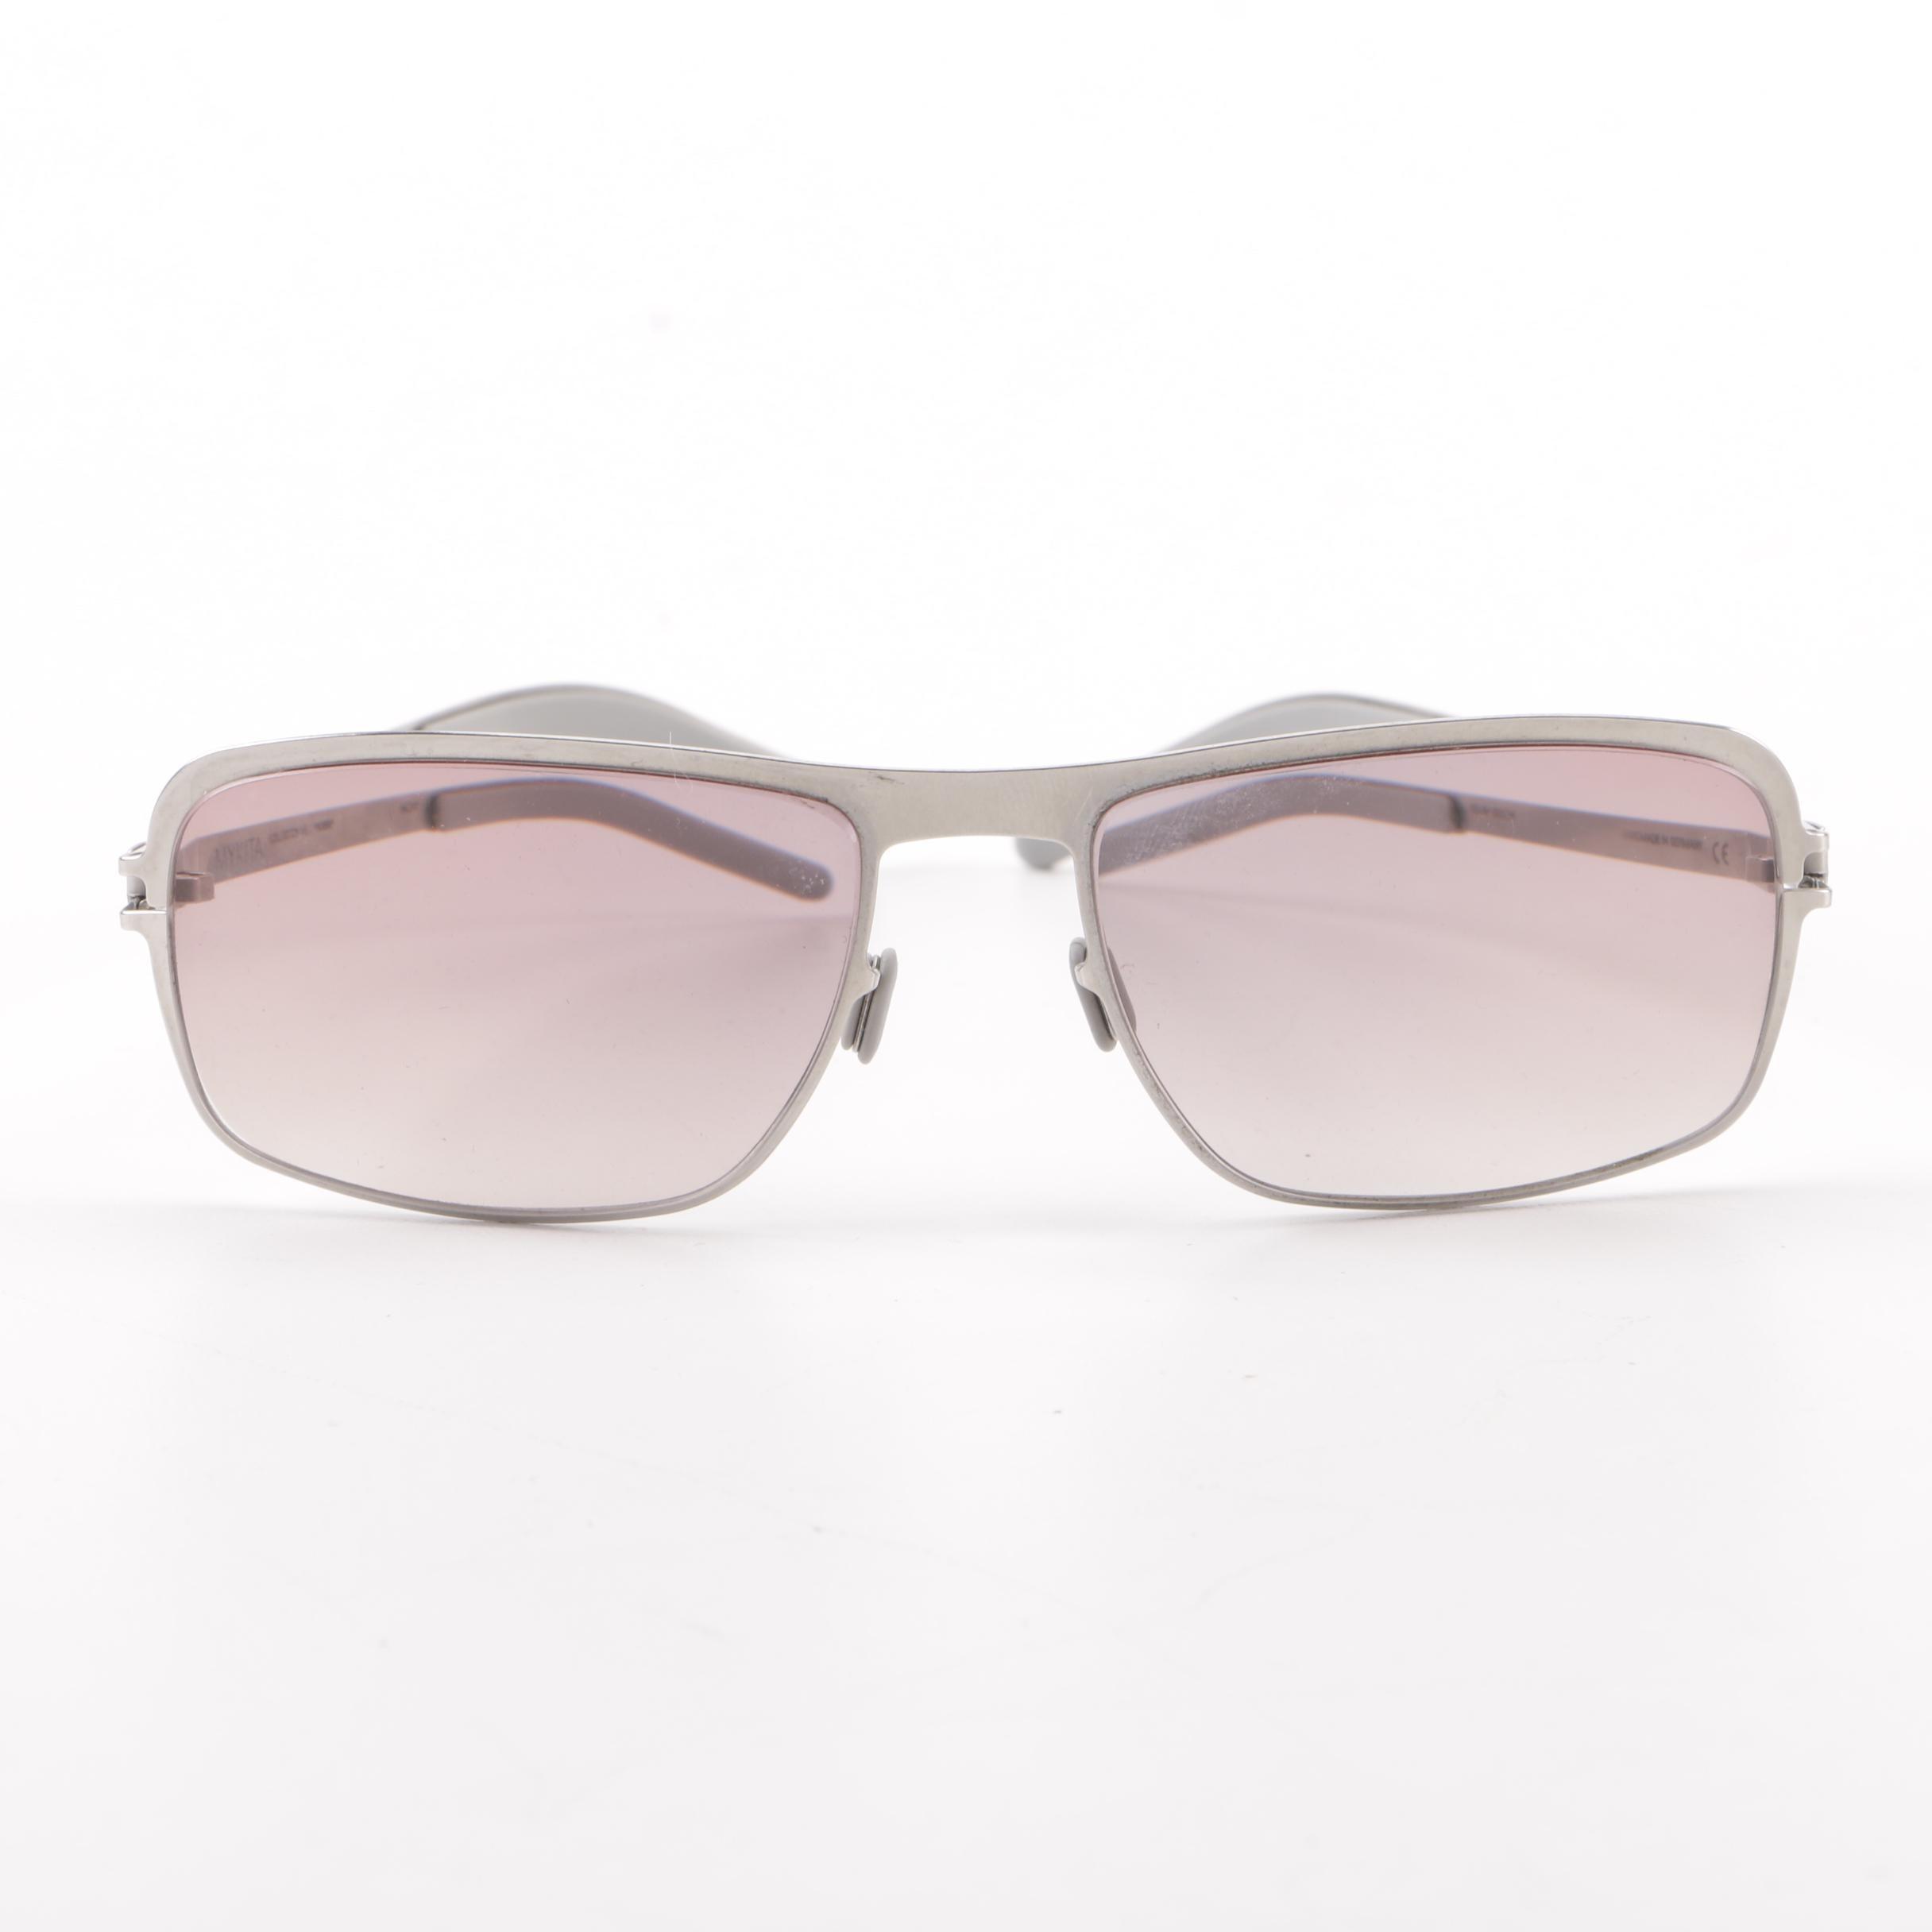 Mykita Collection No.1 Robin Stainless Steel Prescription Gradient Sunglasses